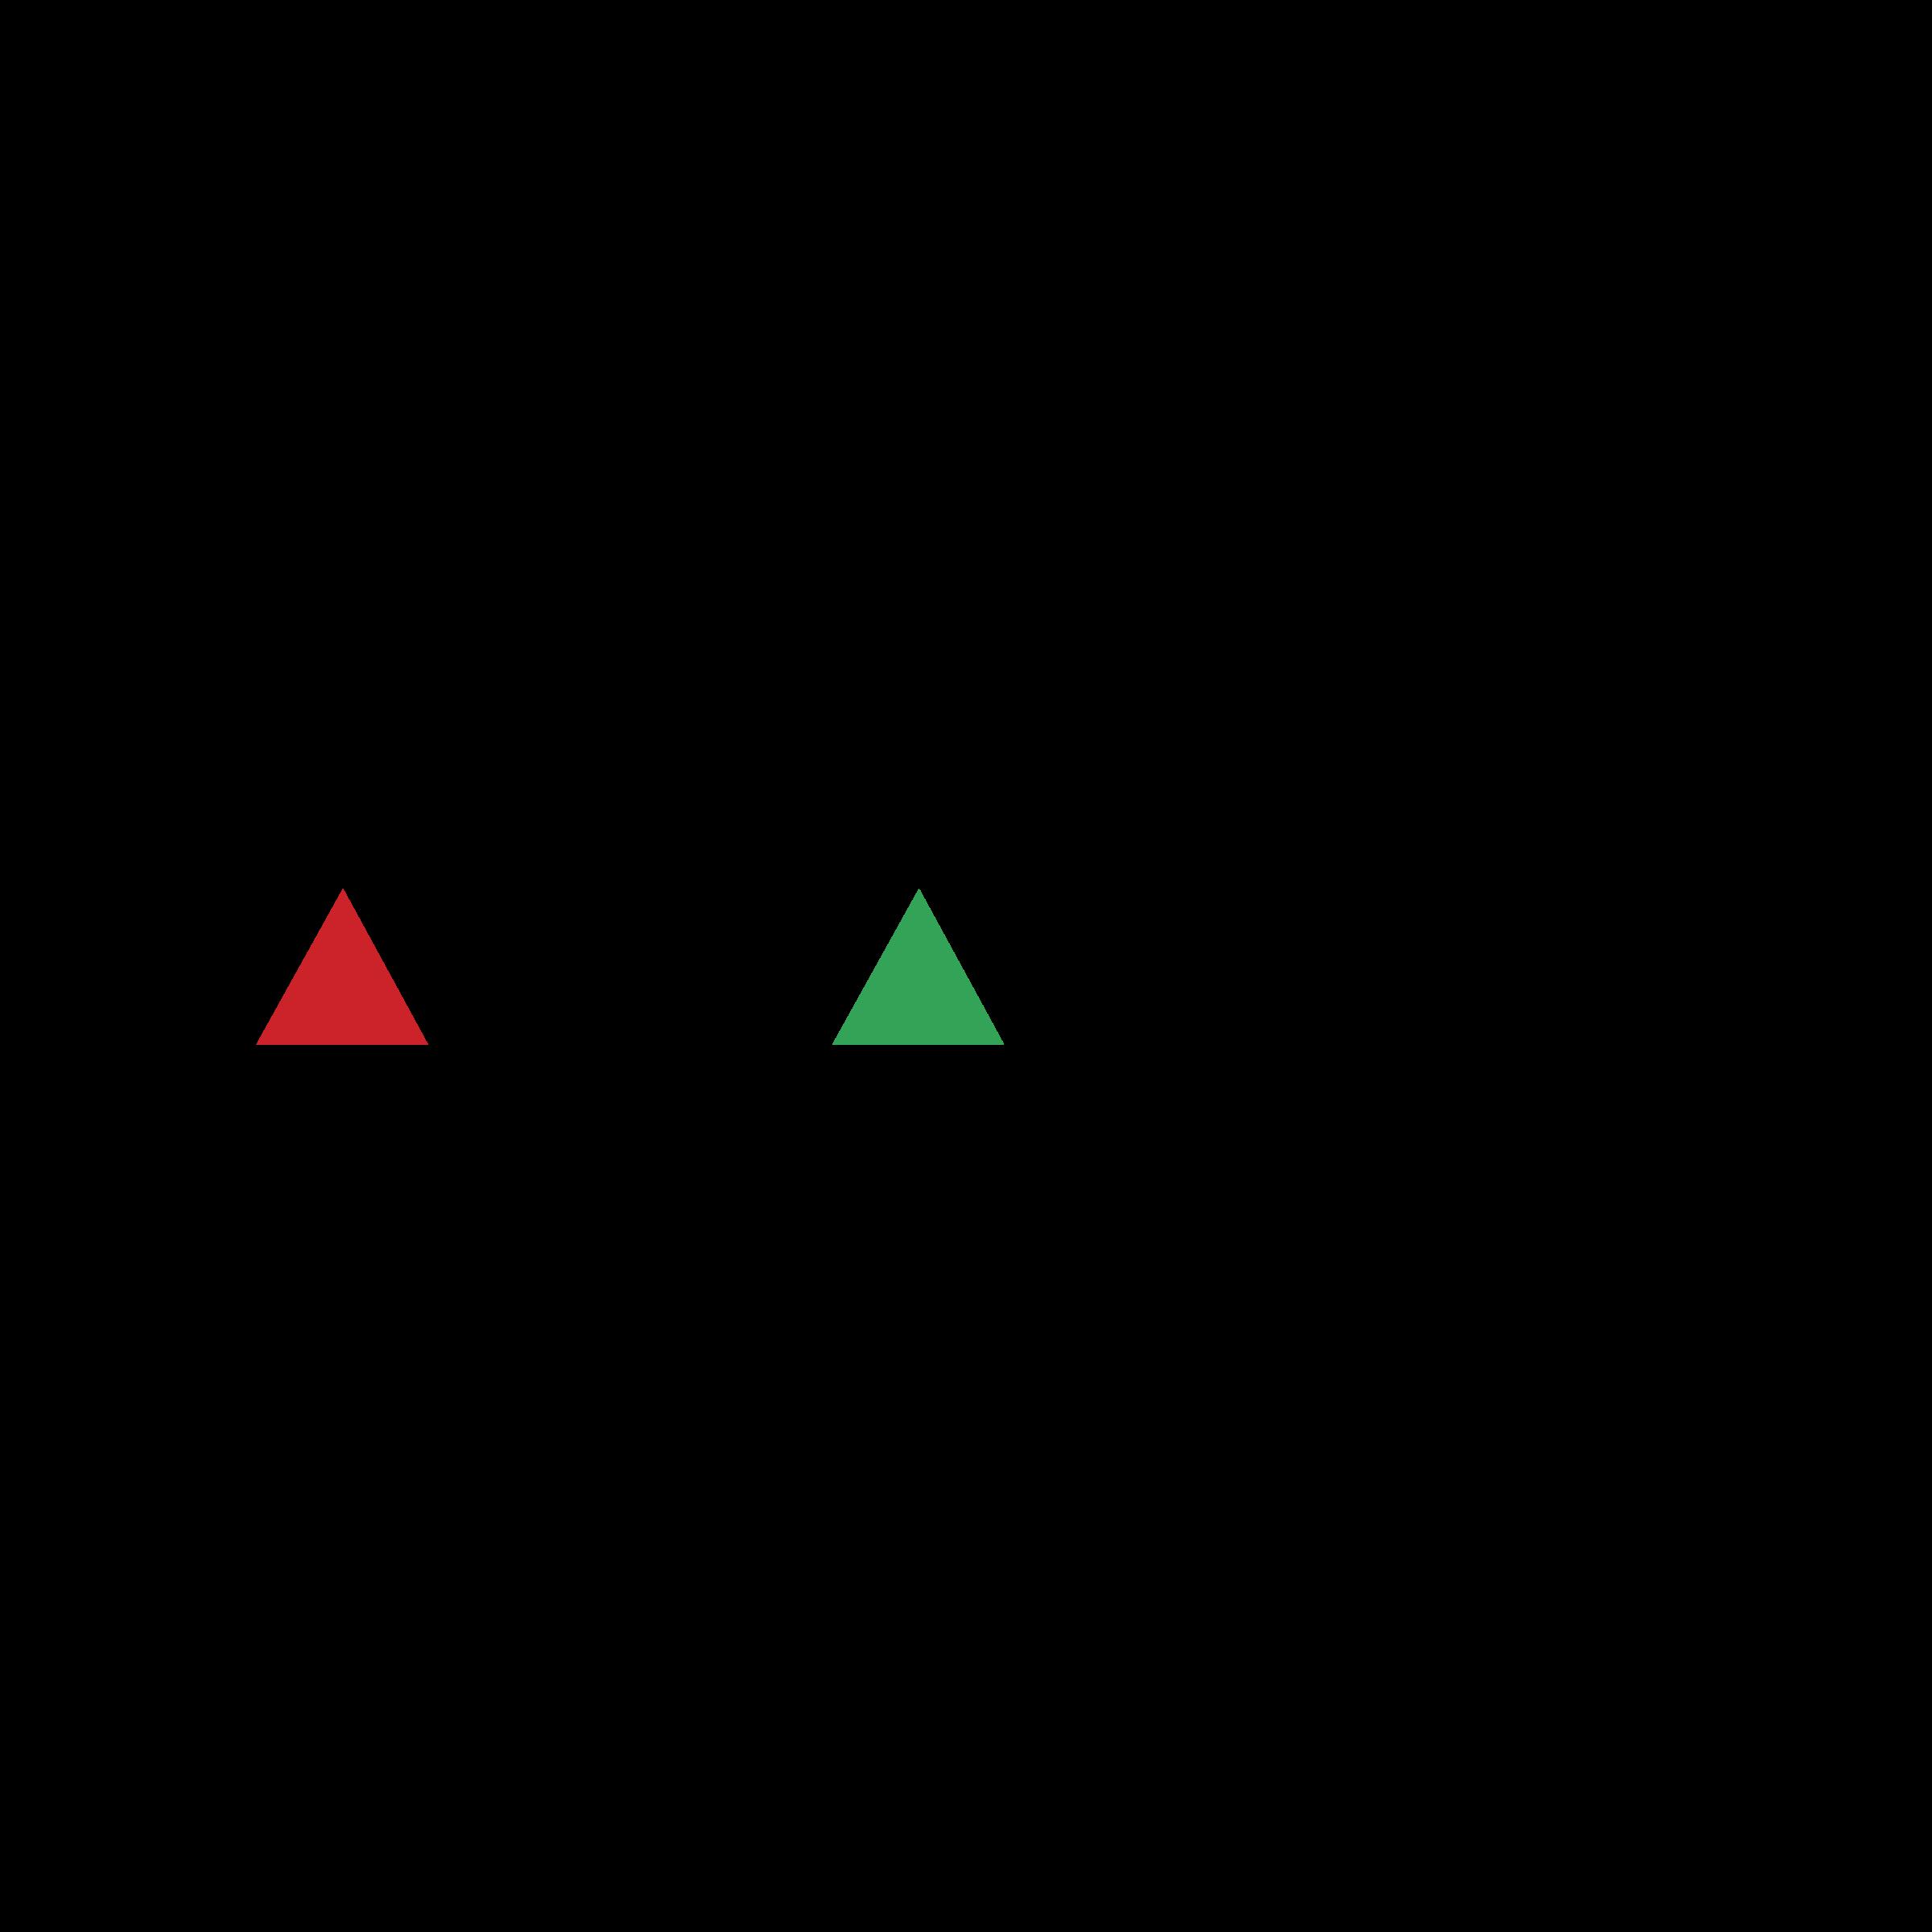 paradox-logo-png-transparent